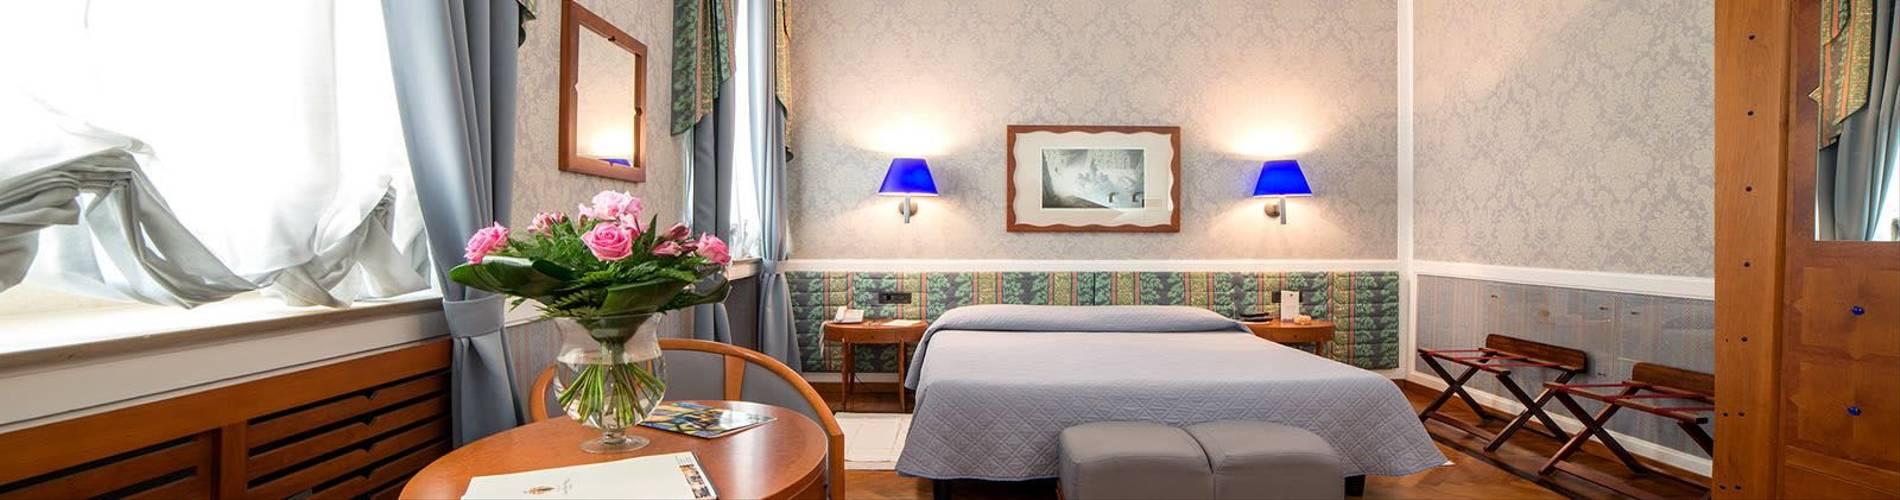 Grand Hotel Ortigia, Sicily, Italy, Double.jpg